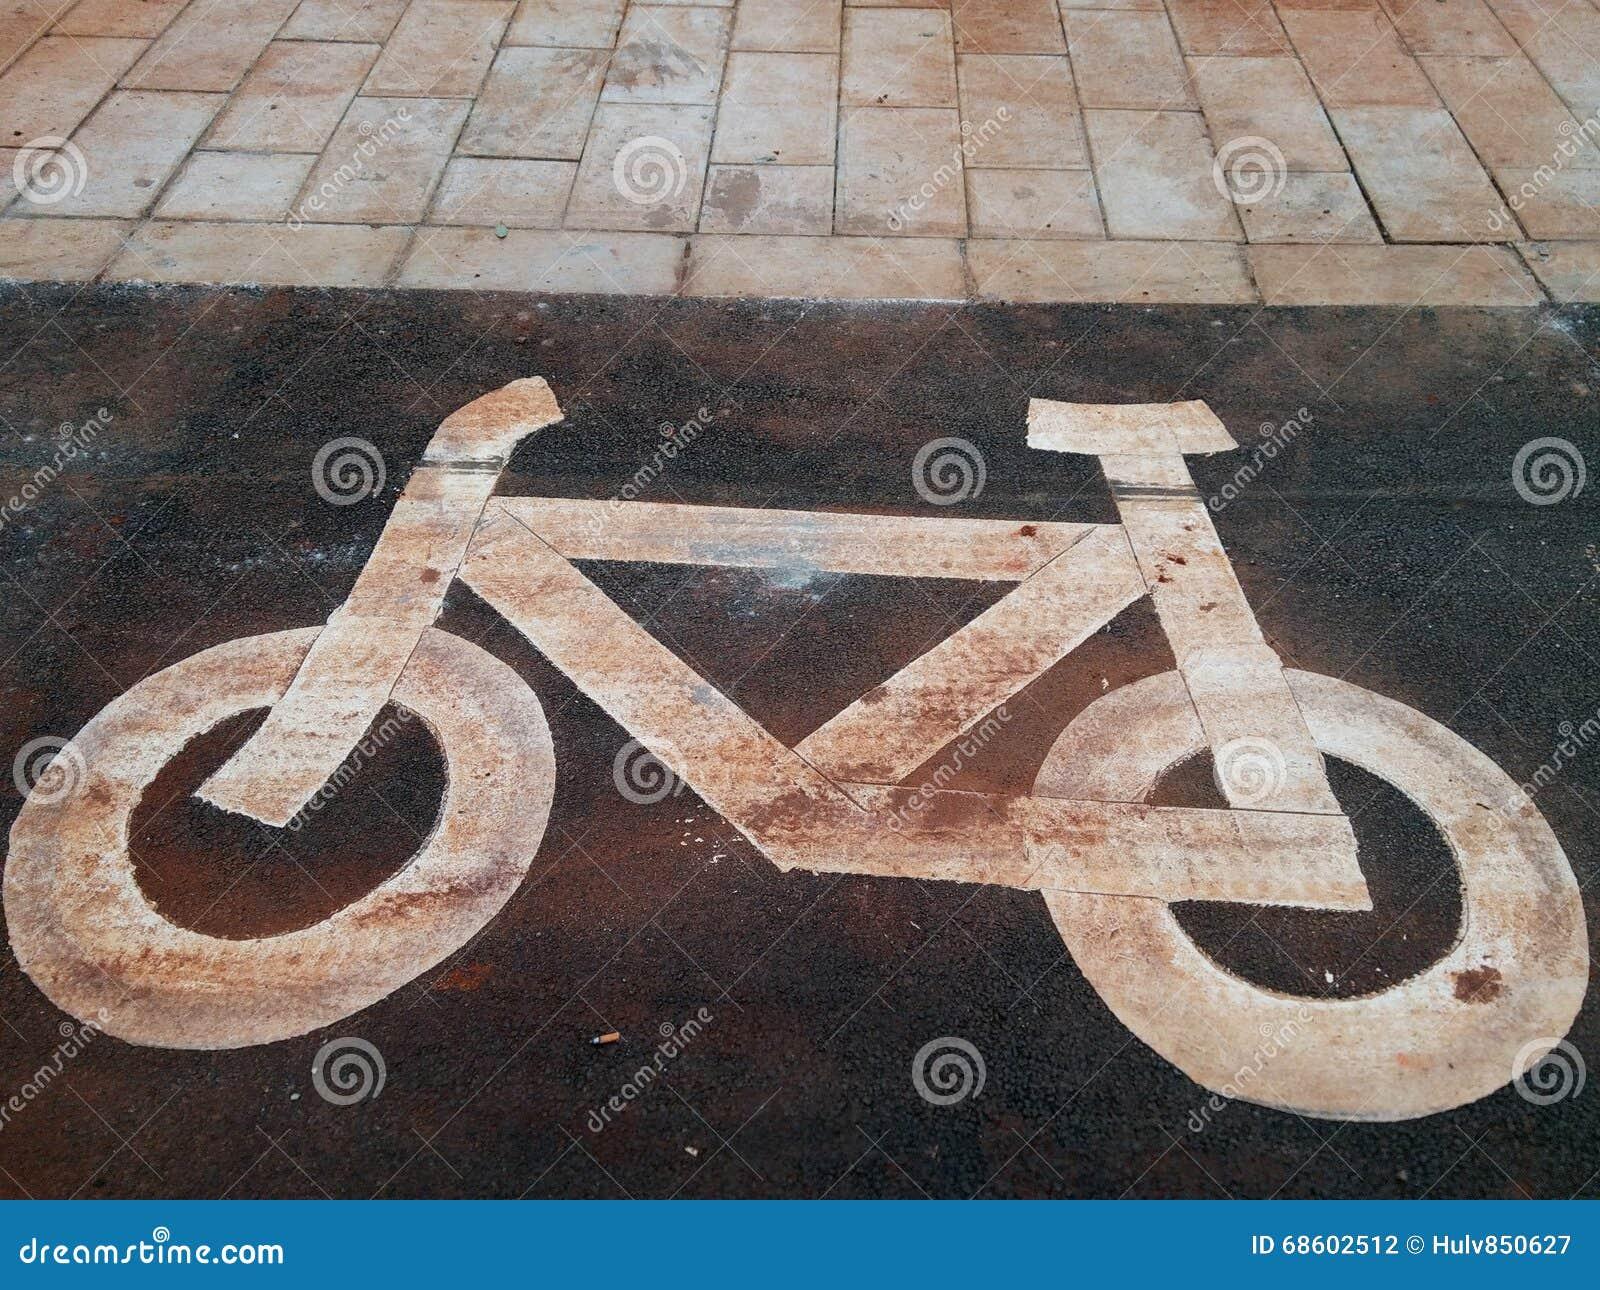 Muestras del carril de la bici